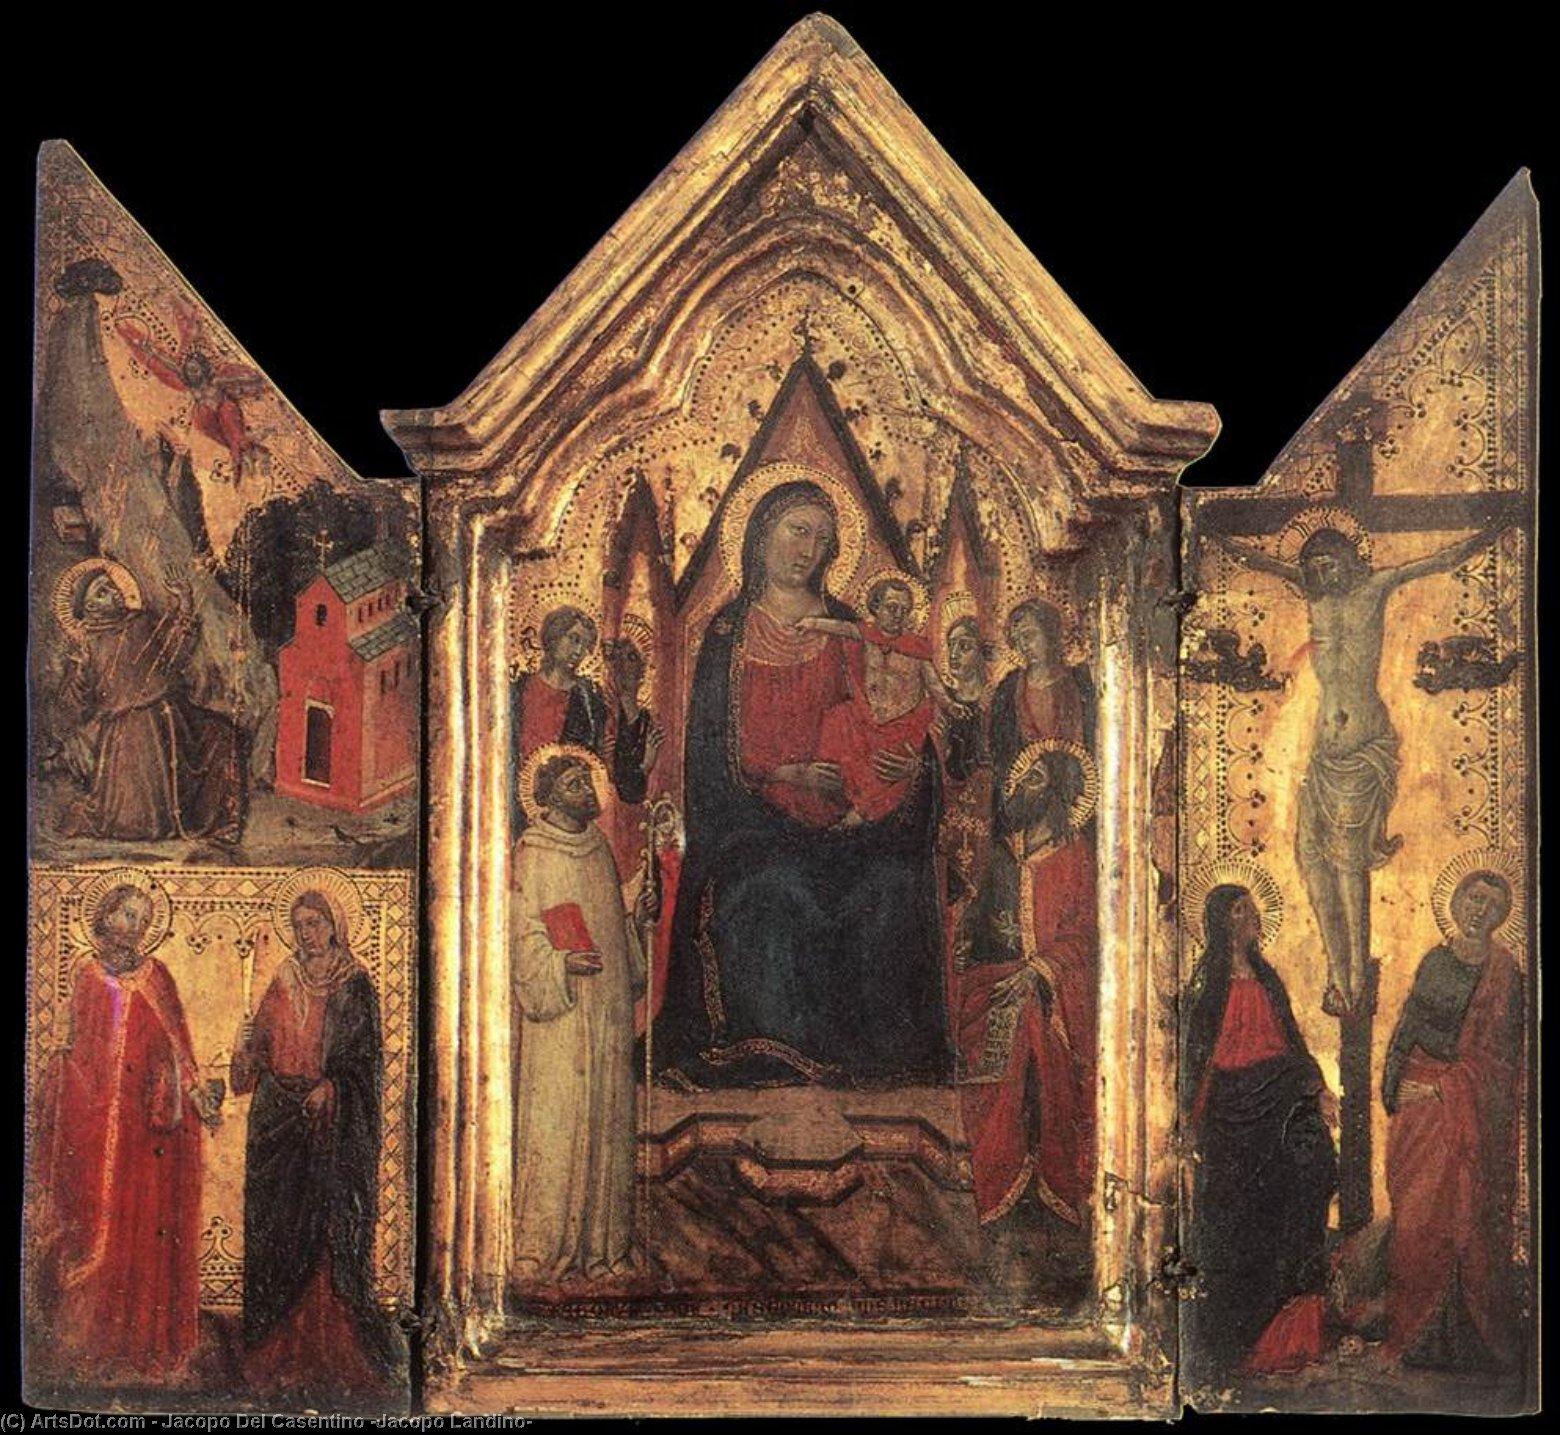 WikiOO.org - Enciklopedija dailės - Tapyba, meno kuriniai Jacopo Del Casentino (Jacopo Landino) - Madonna Enthroned with Angels and Saints